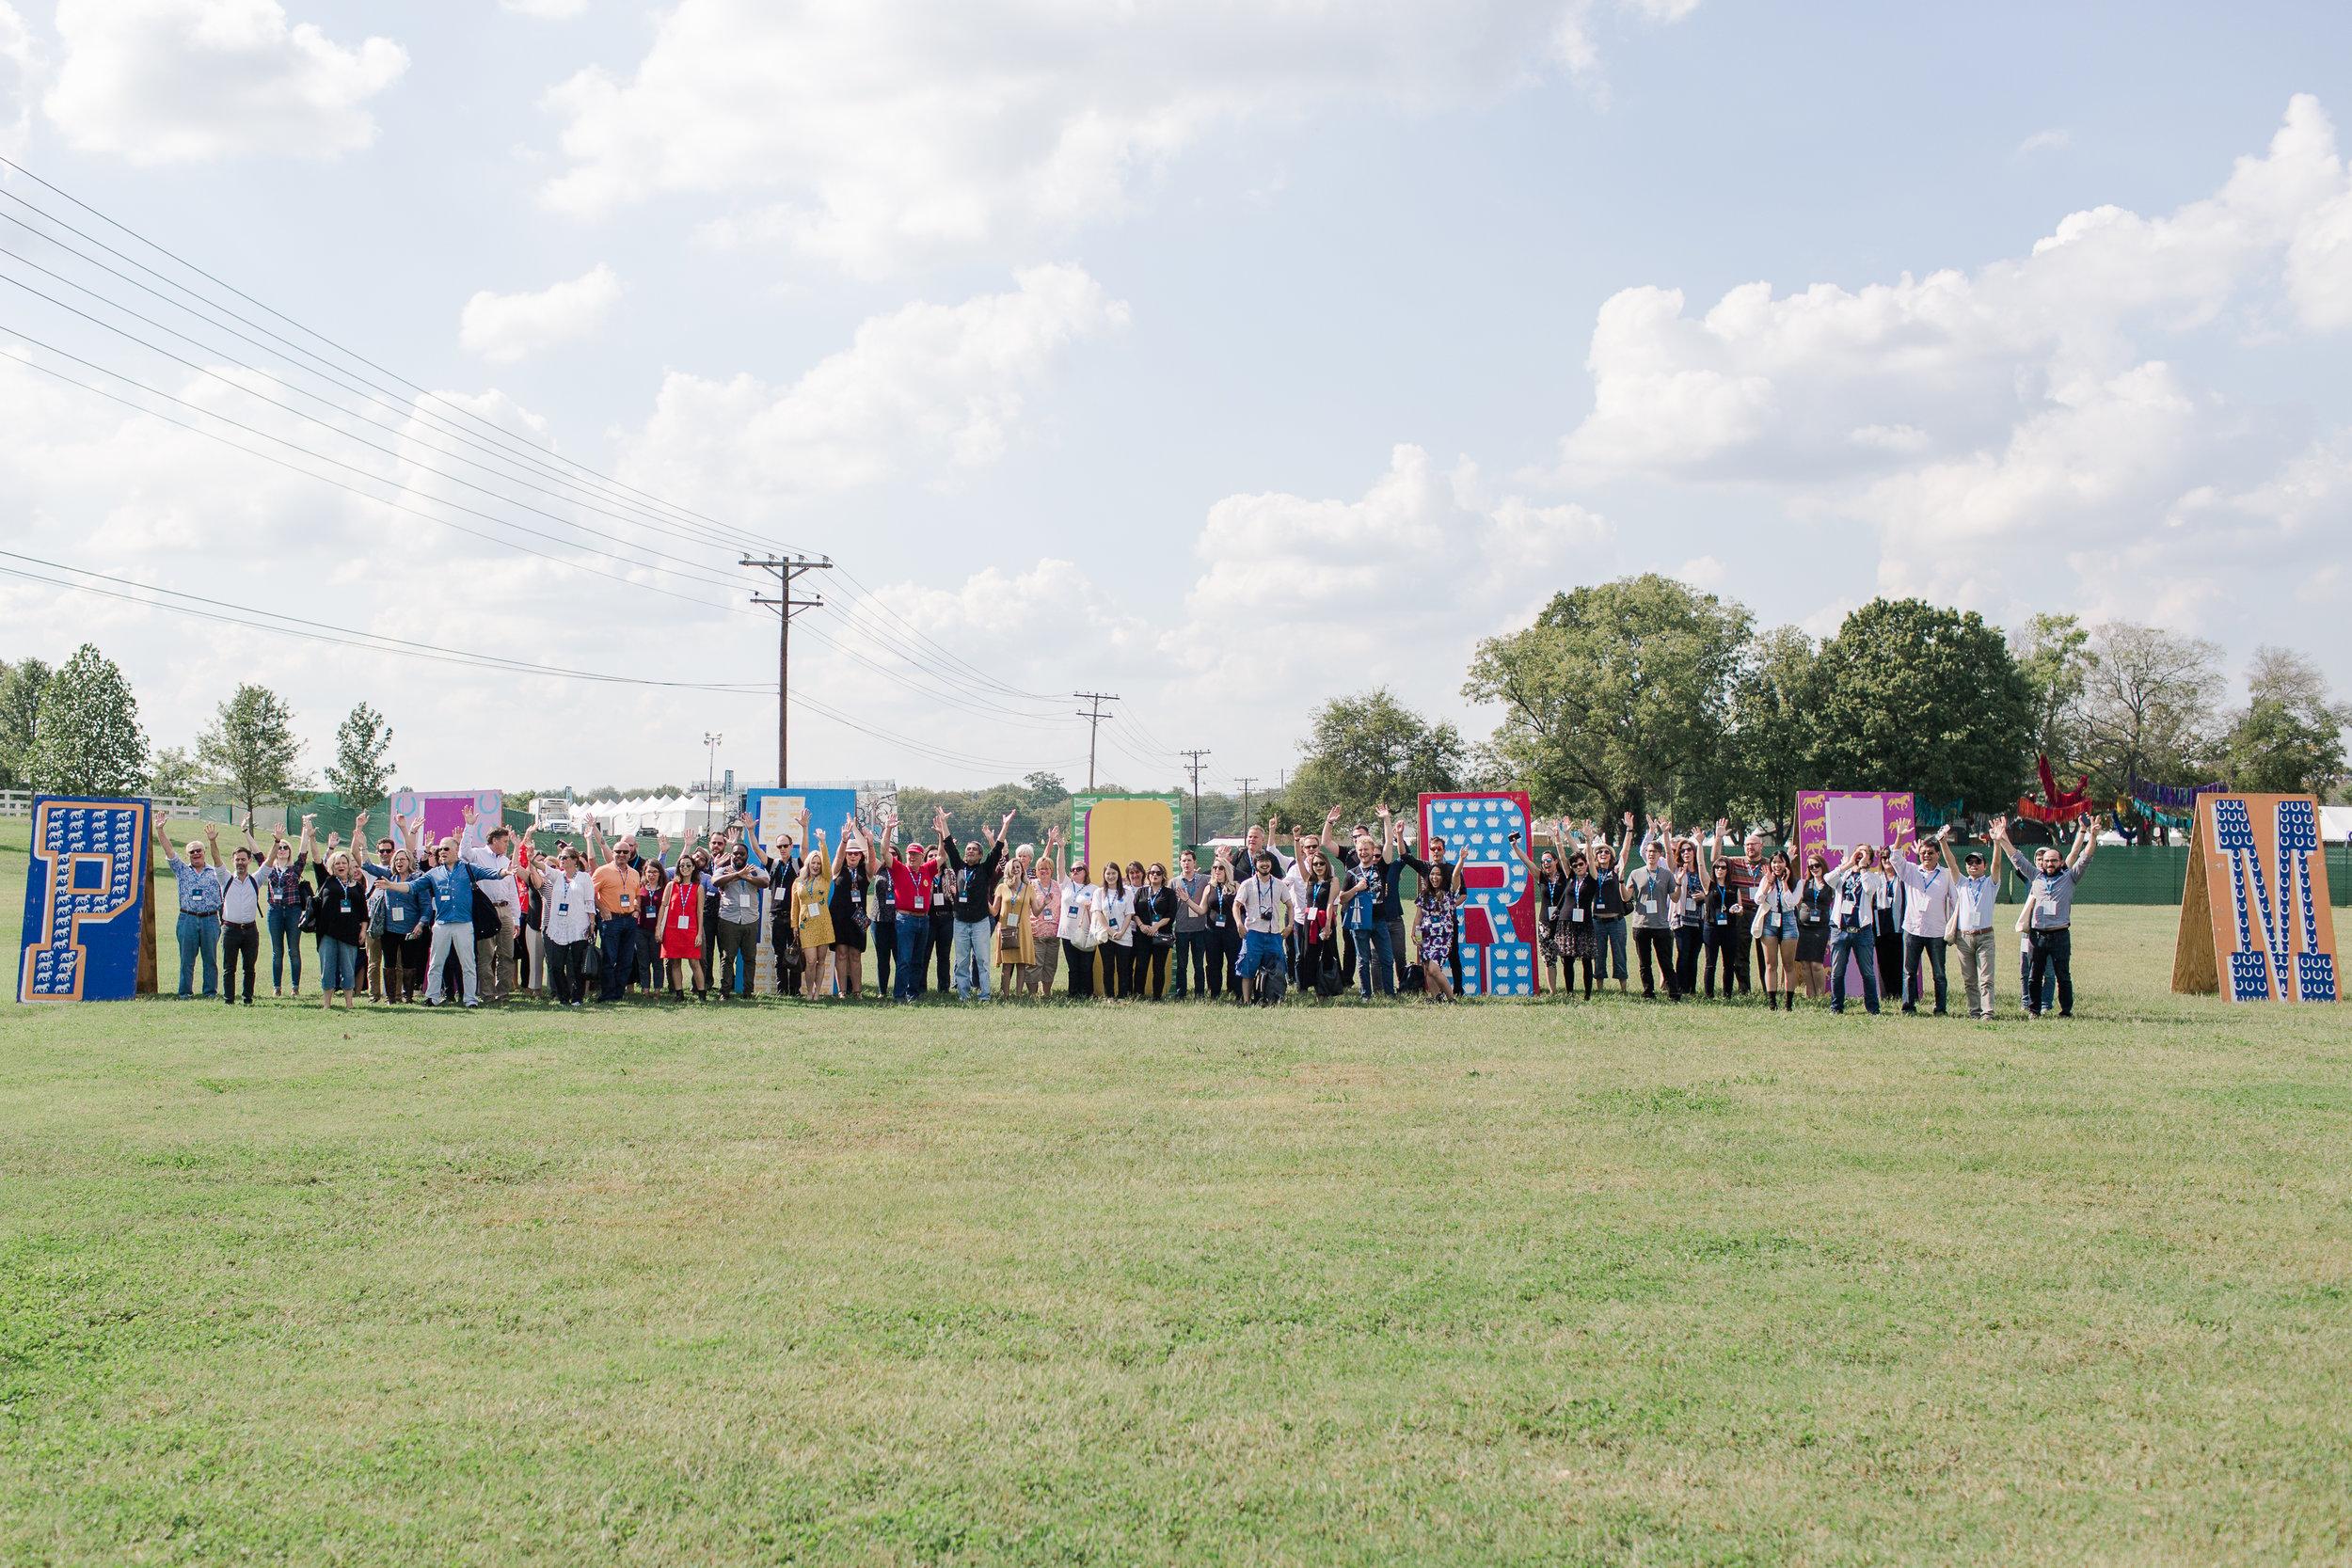 Attendees at Pilgrimage Festival after MTC Franklin 20217